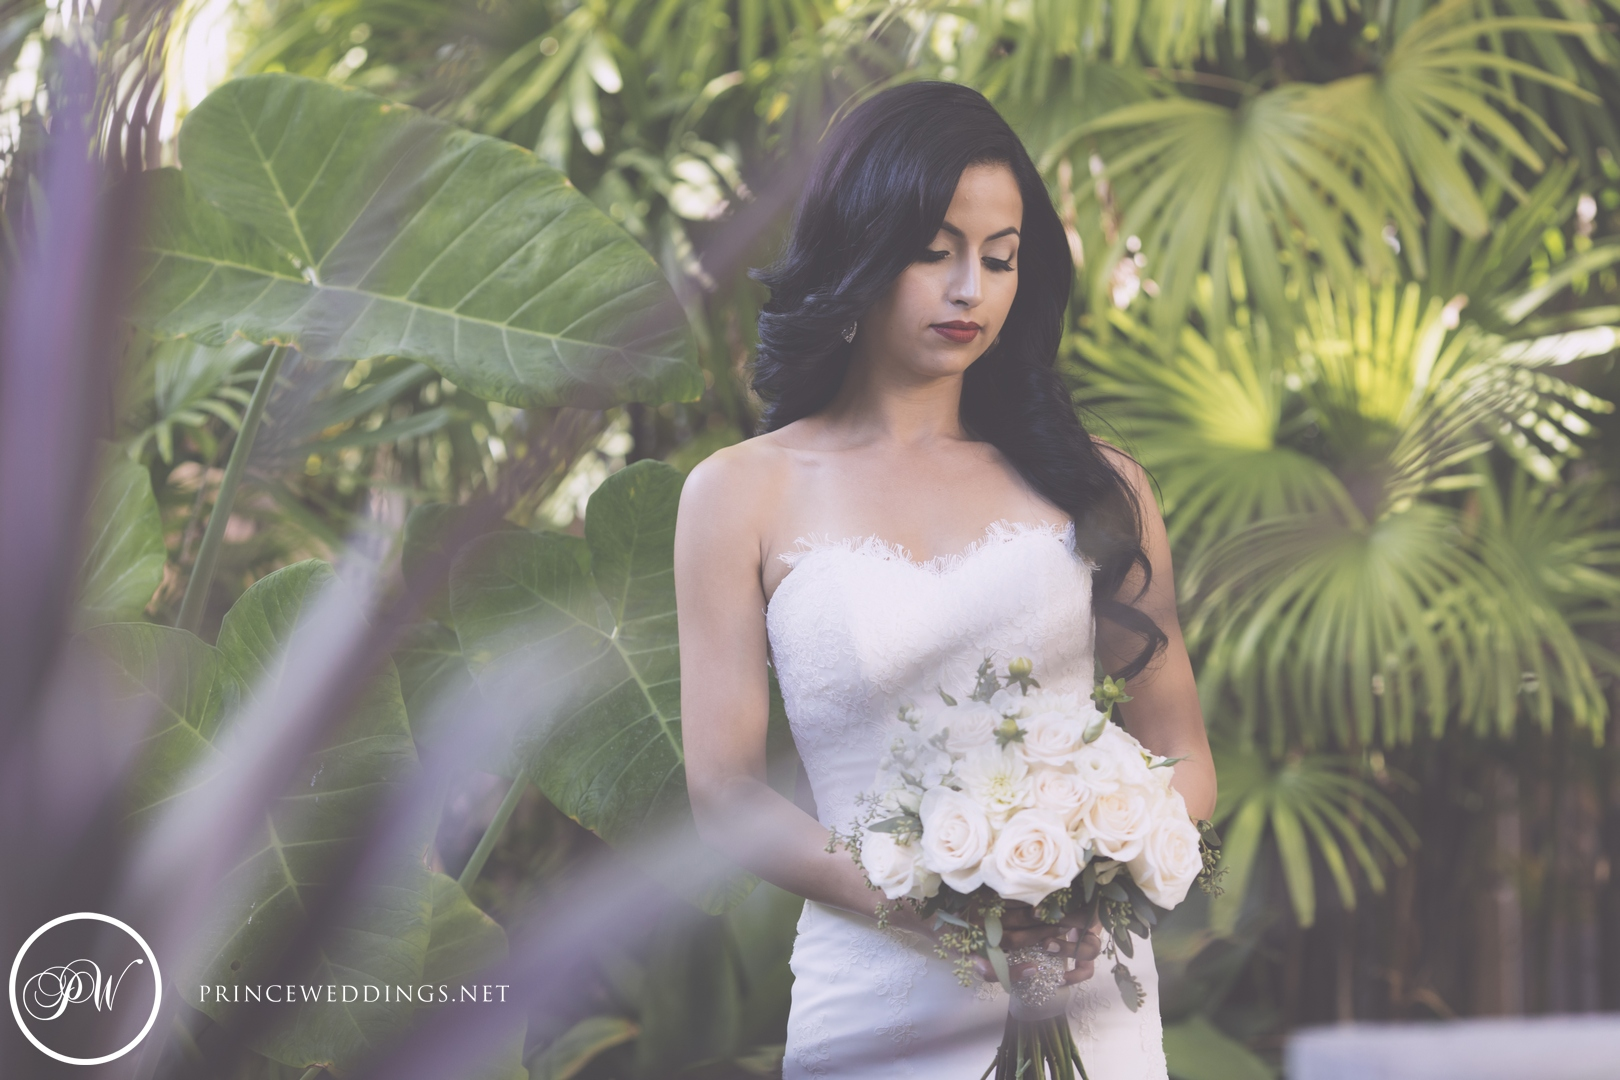 Los Angeles River Center & Gardens Wedding Photos-199.jpg